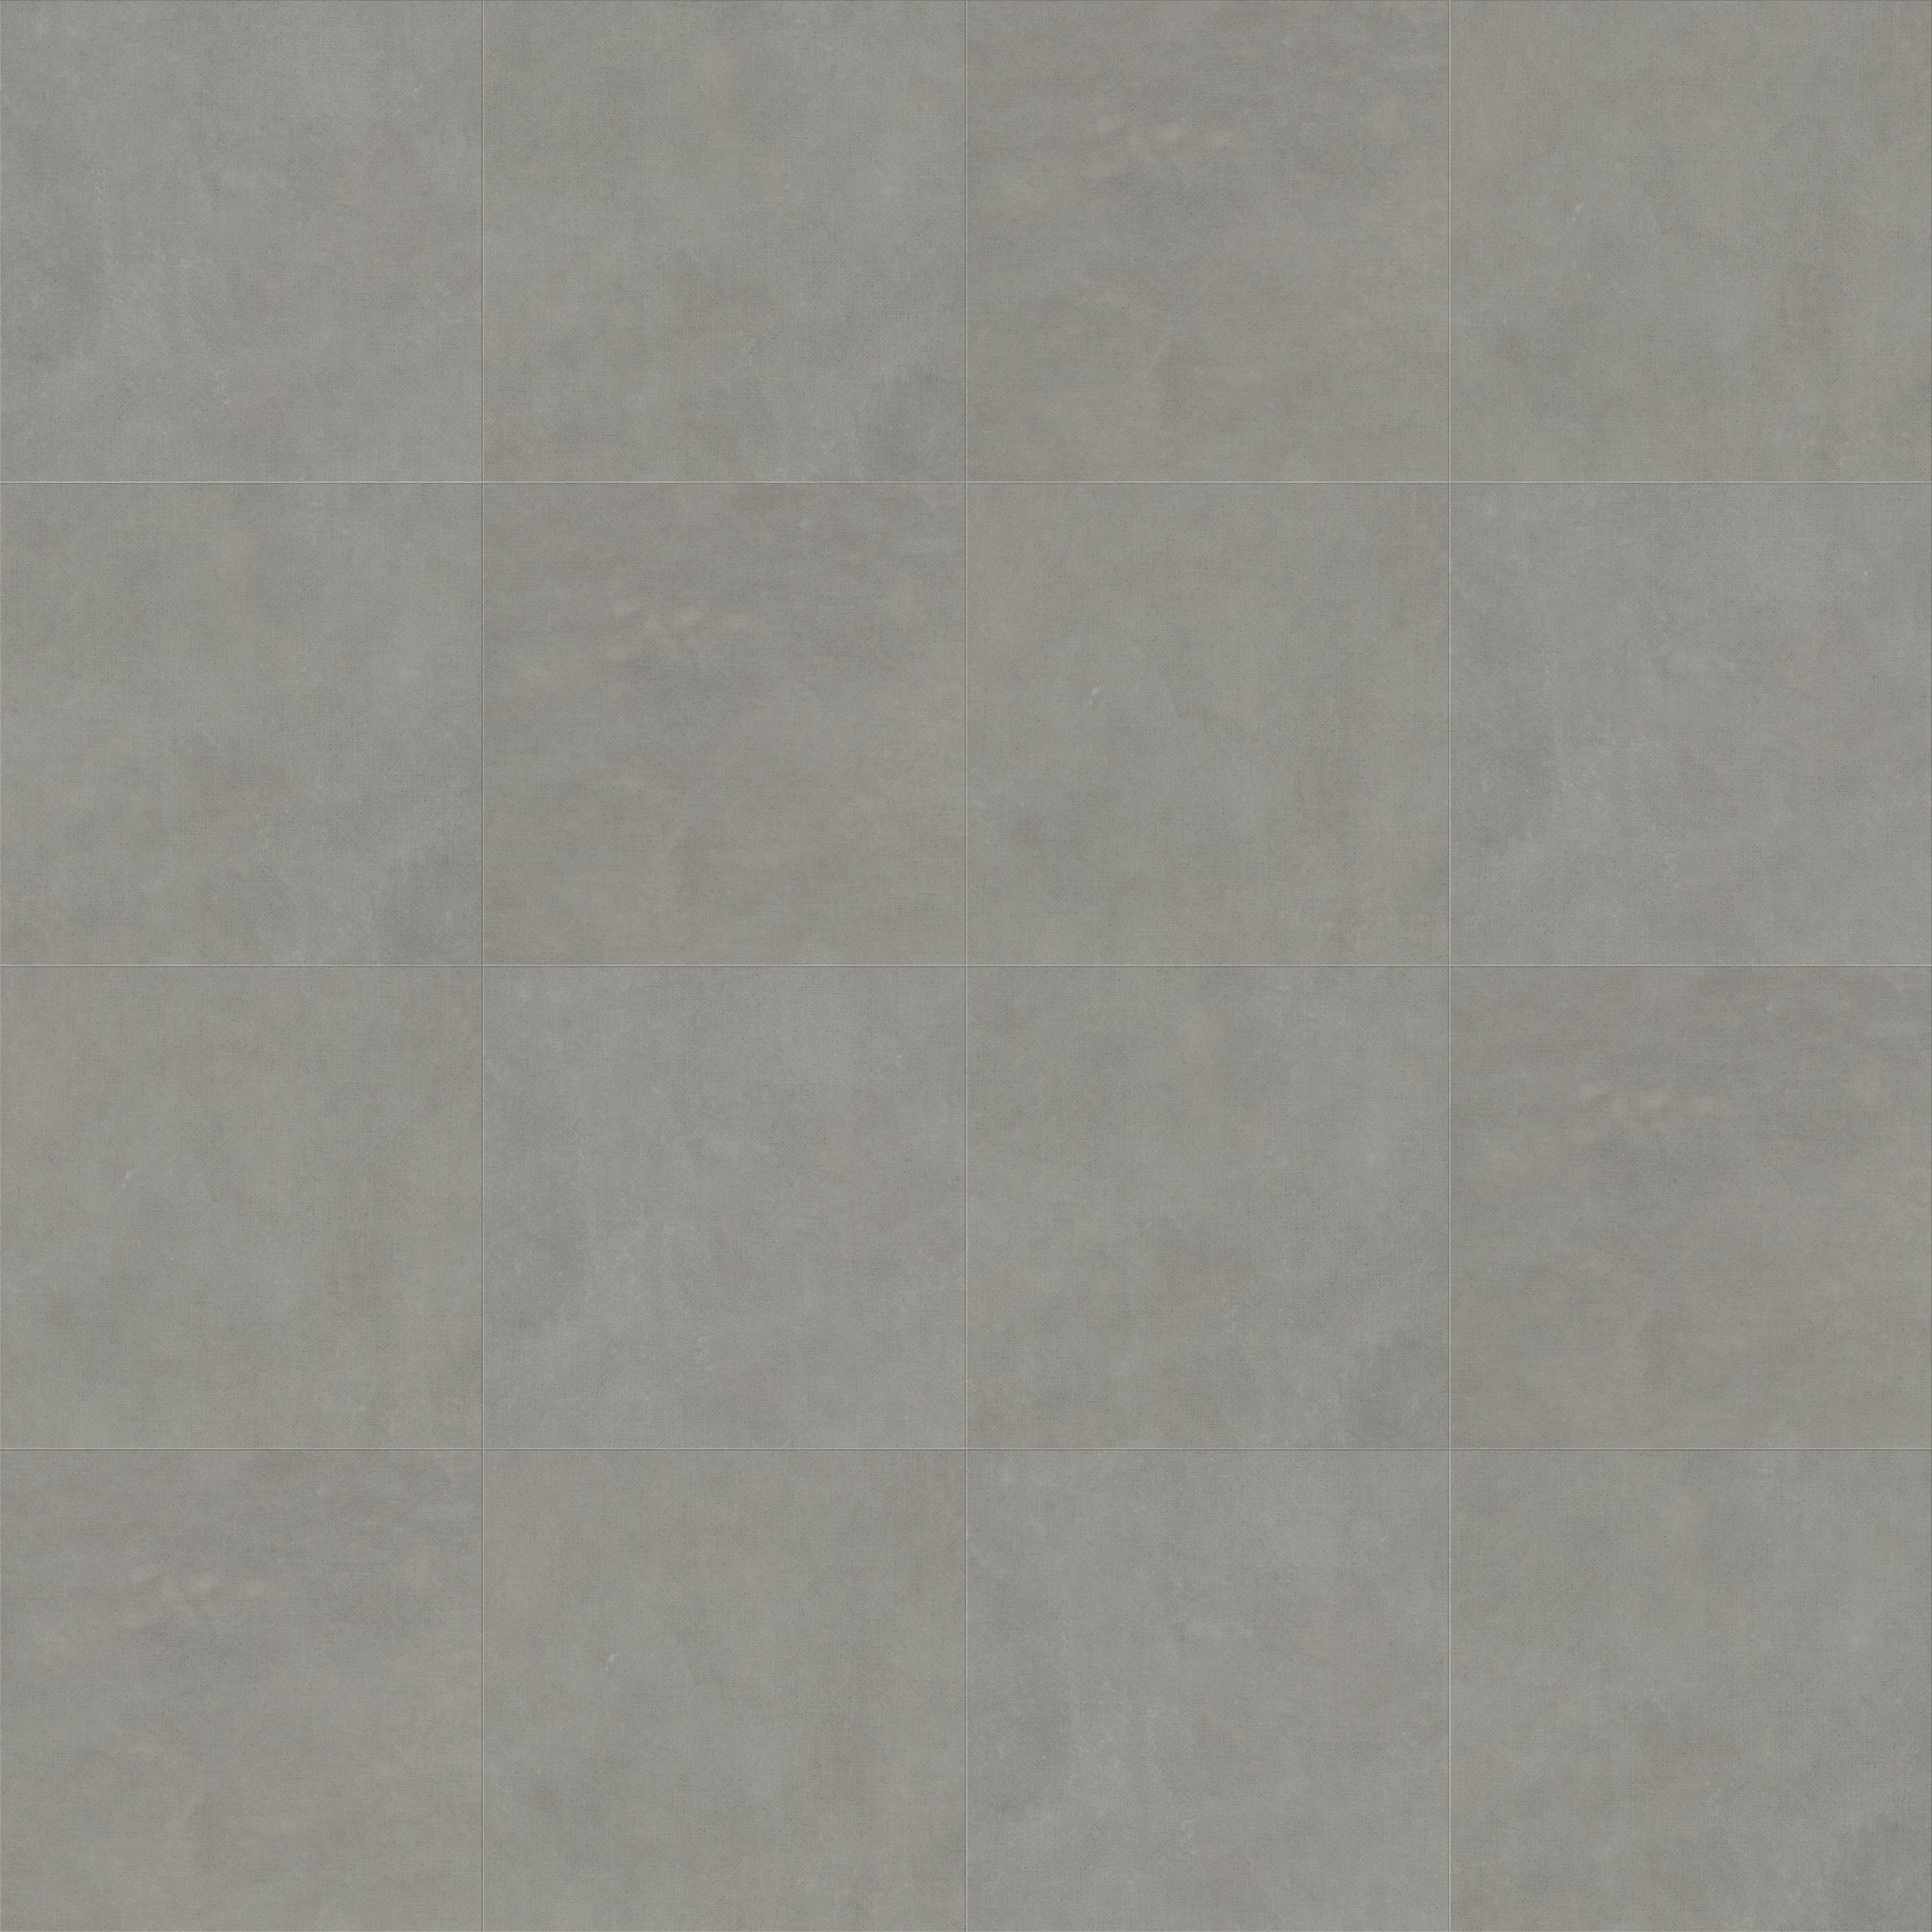 Allura_Stone_-s62536_smoke_texture